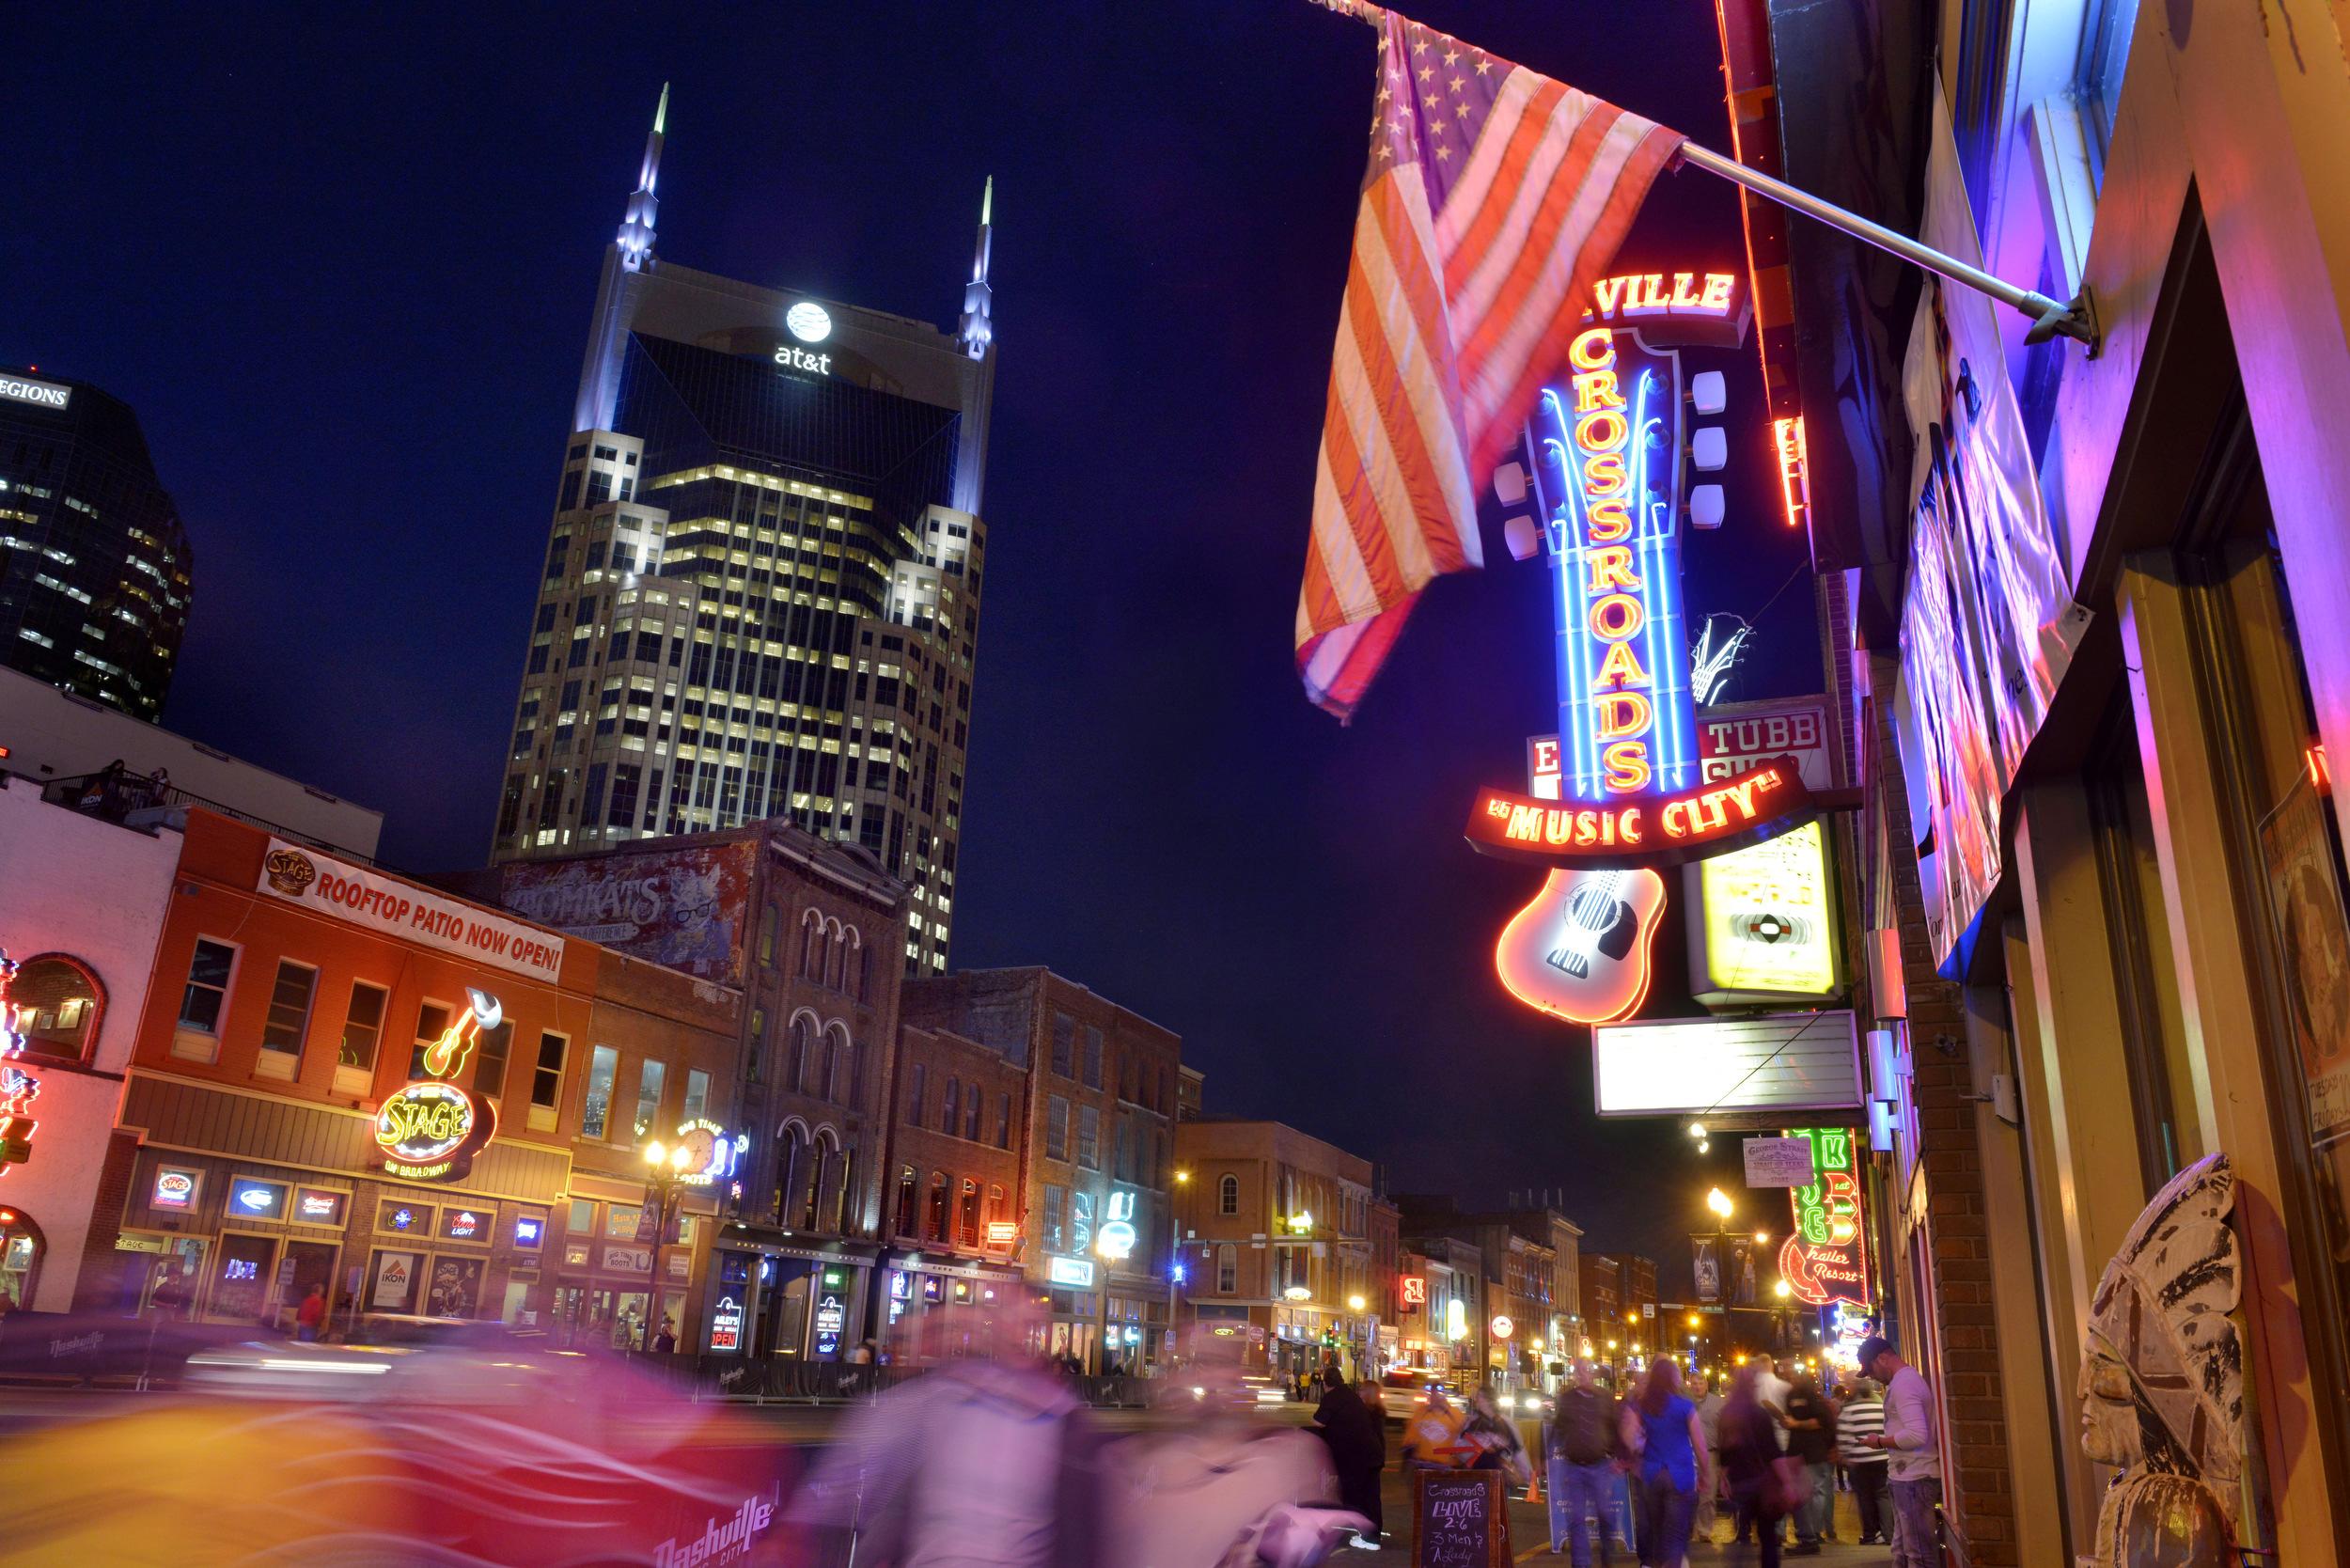 Broadway's honky tonk row in Nashville, Tenn.